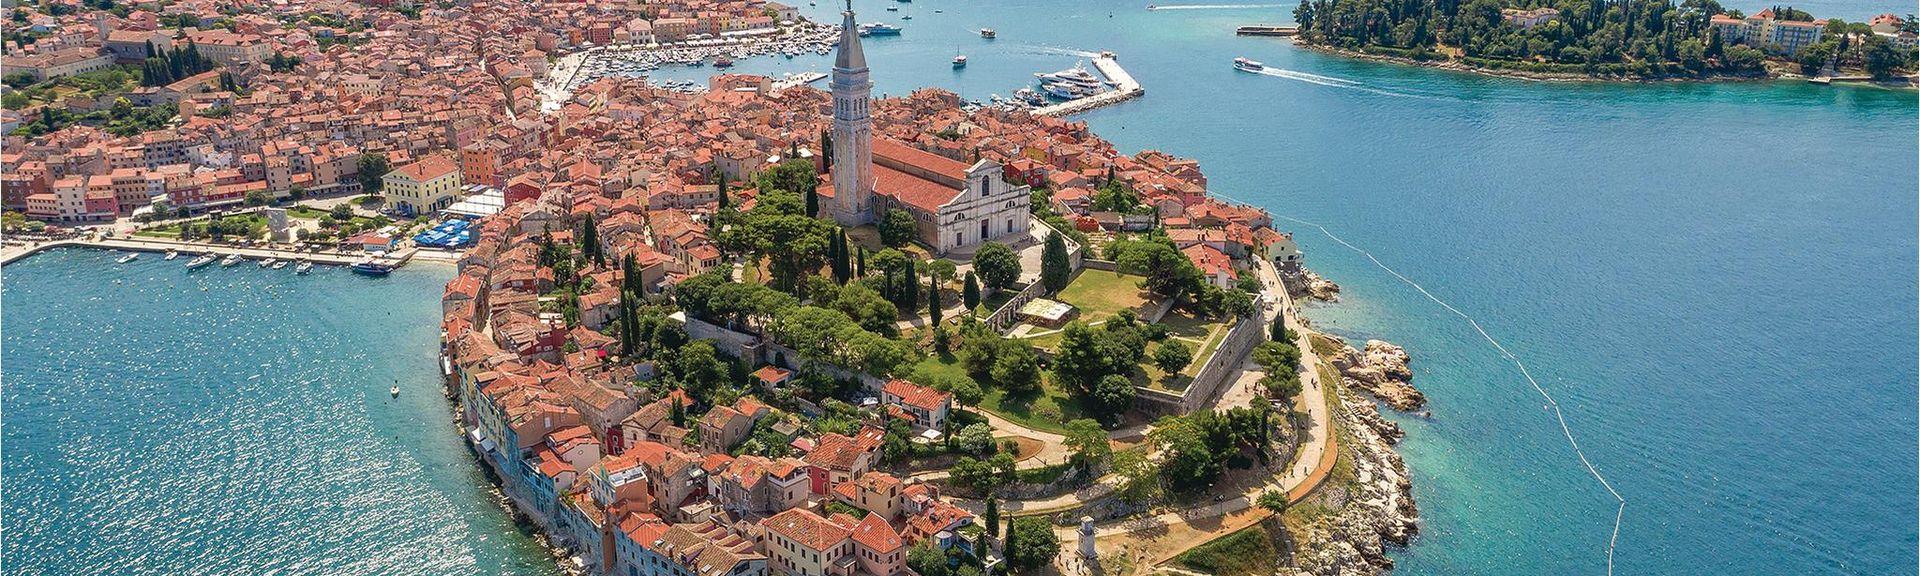 Jehnići, Porec, Istria, Croácia